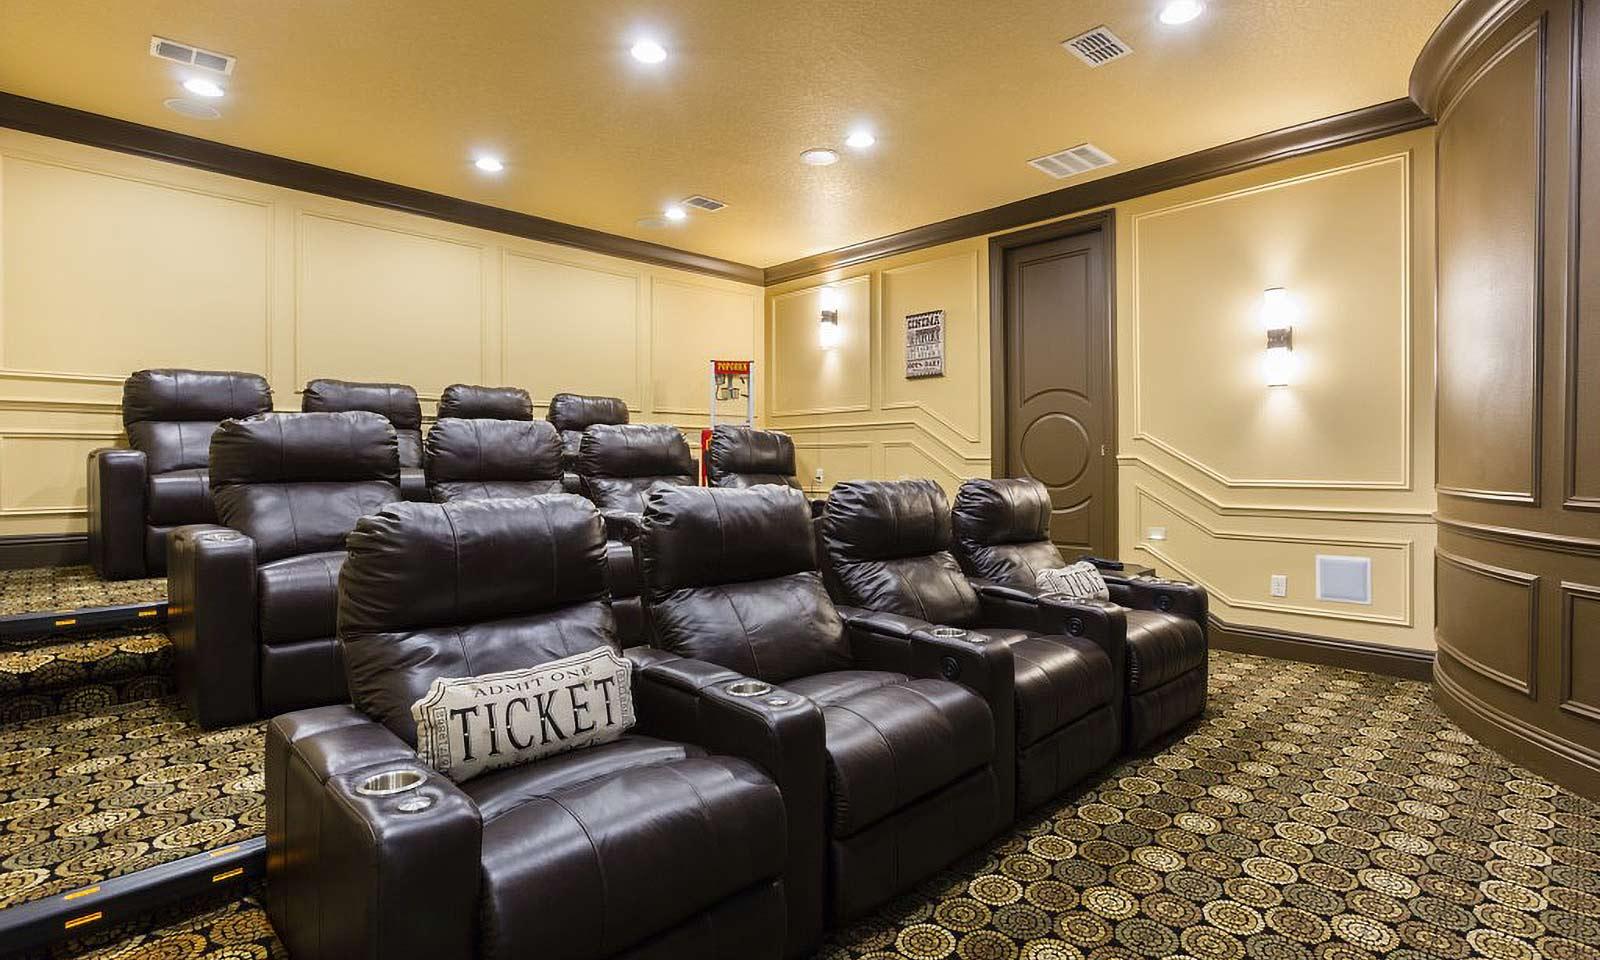 [amenities:Theater-Room:1] Theater Room